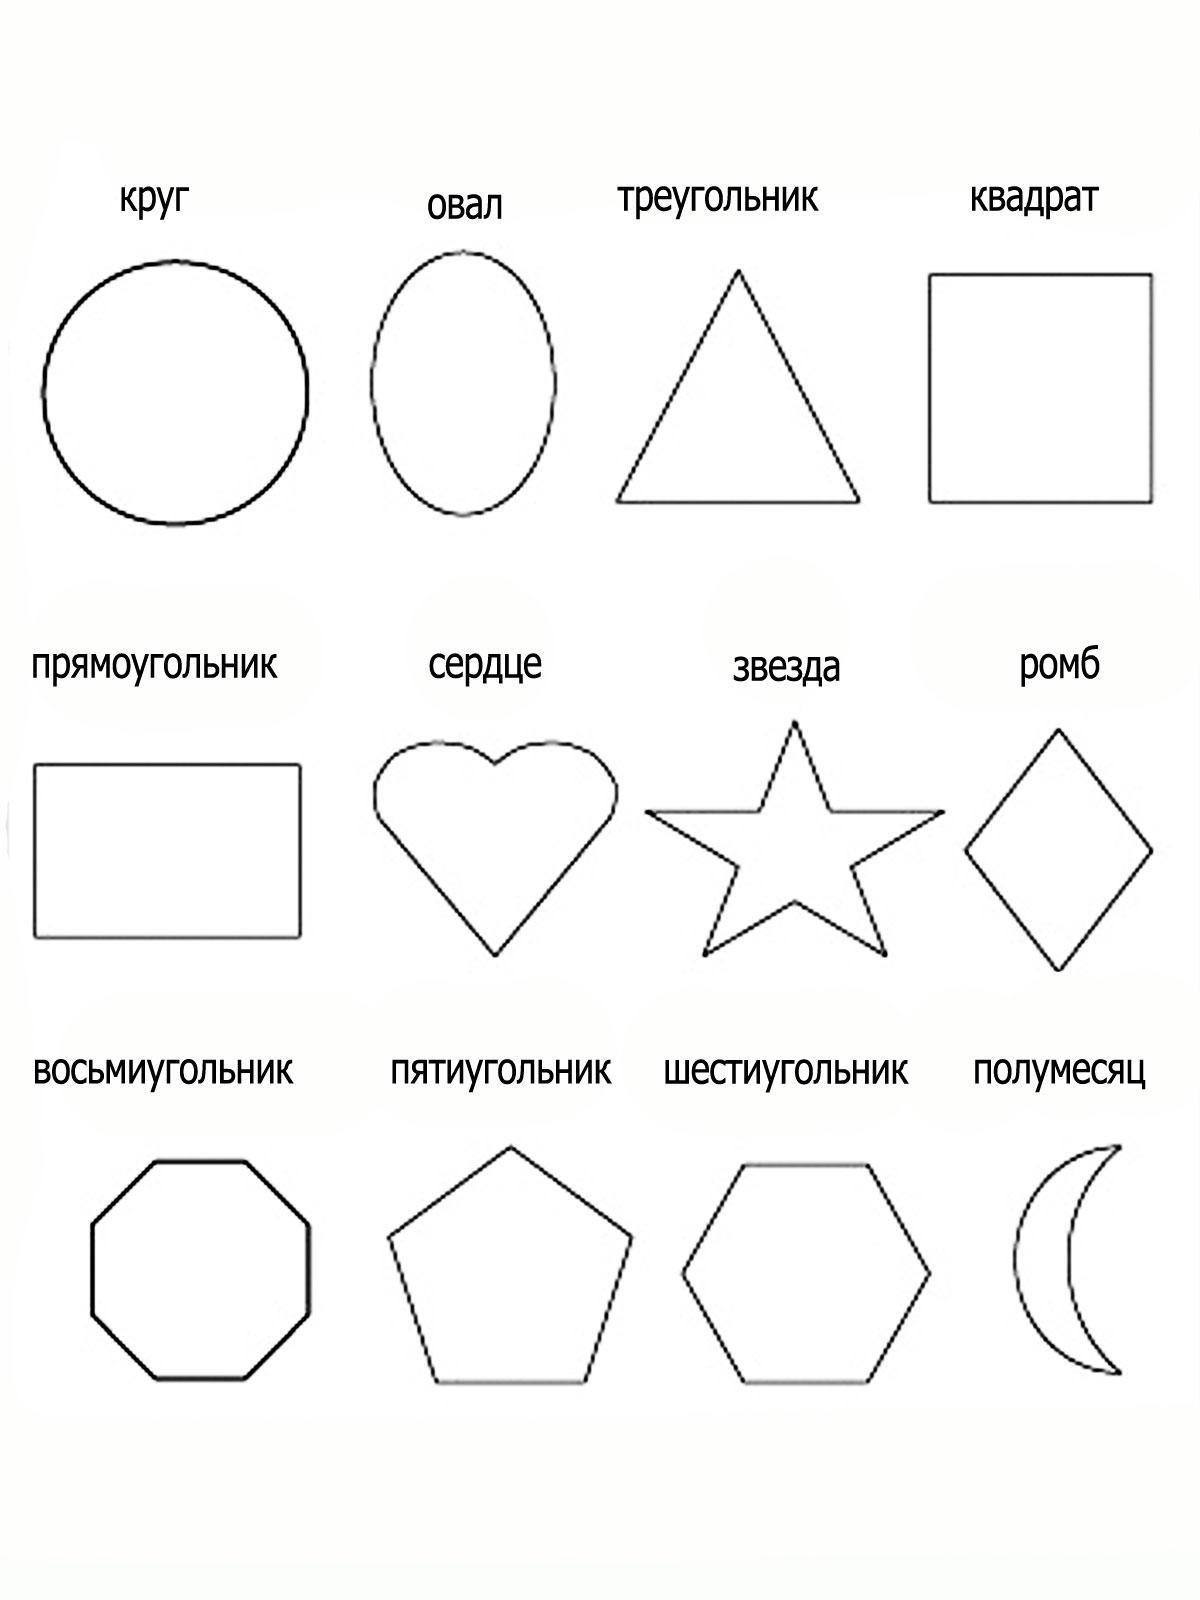 C:\Users\Администратор\Desktop\coloring-geometric-shapes6.jpg